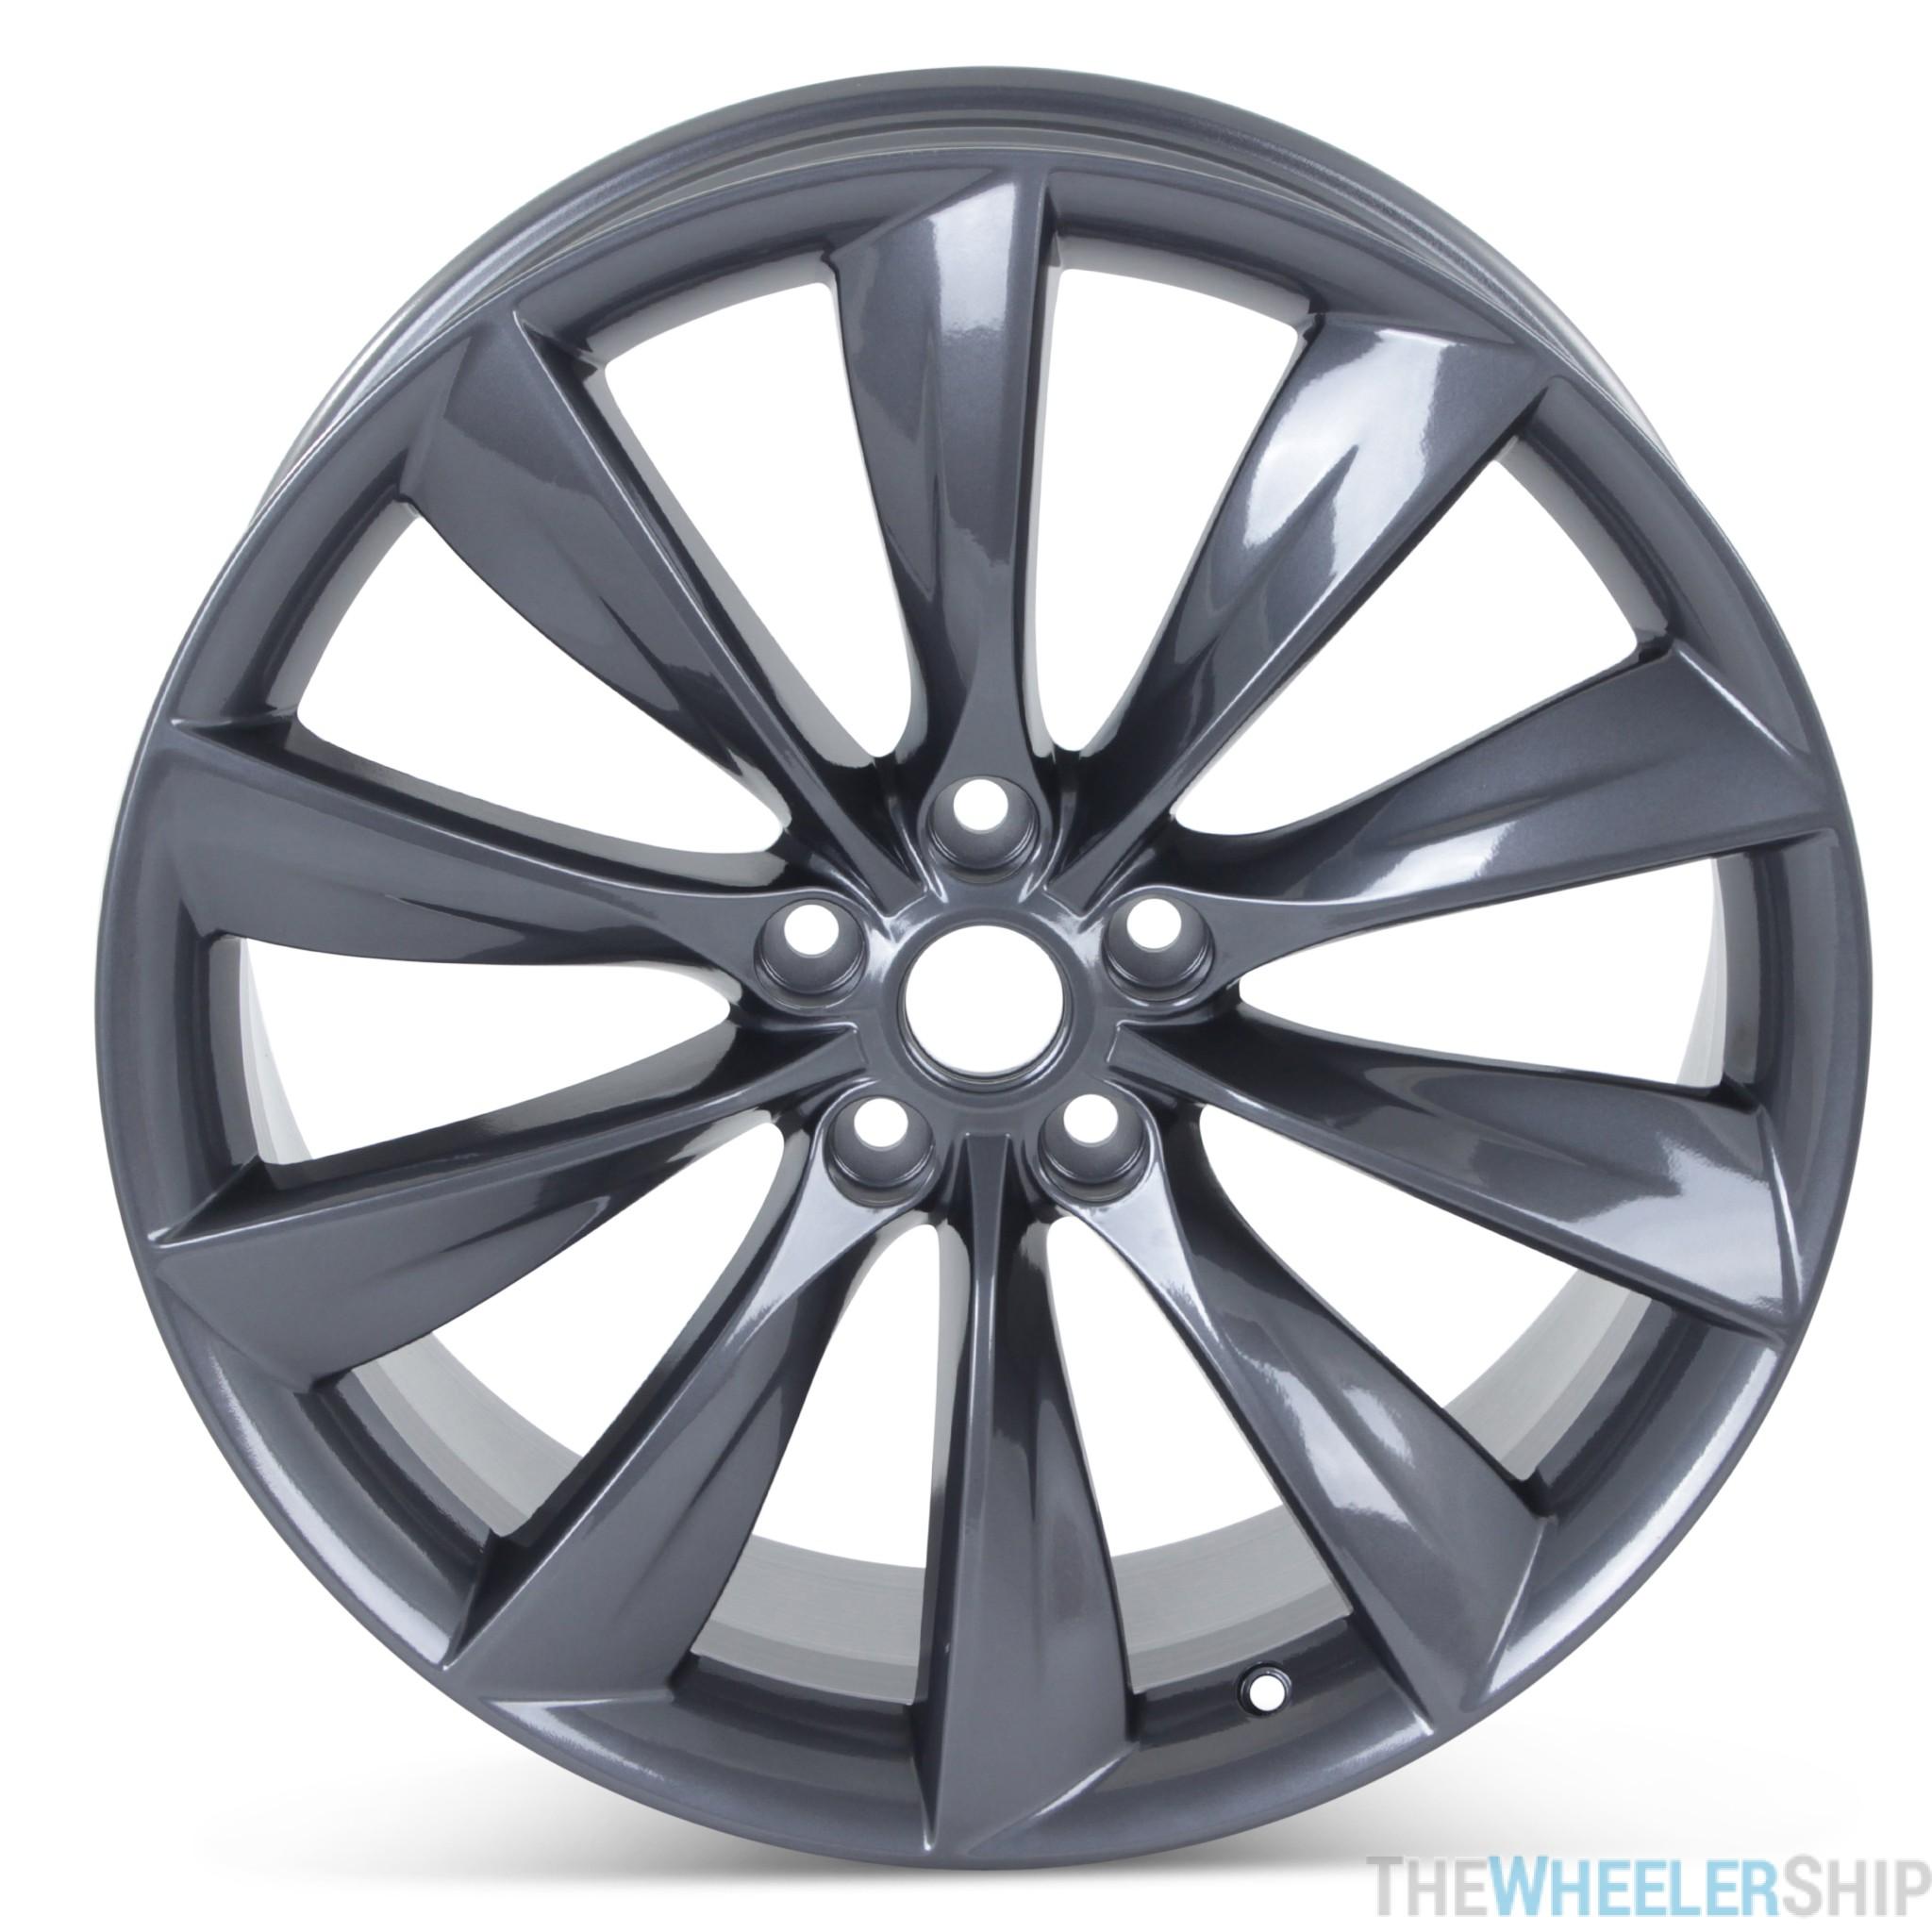 Tesla Model S 2012-2017 98727 aluminum OEM wheel rim 21 x 8.5 Silver